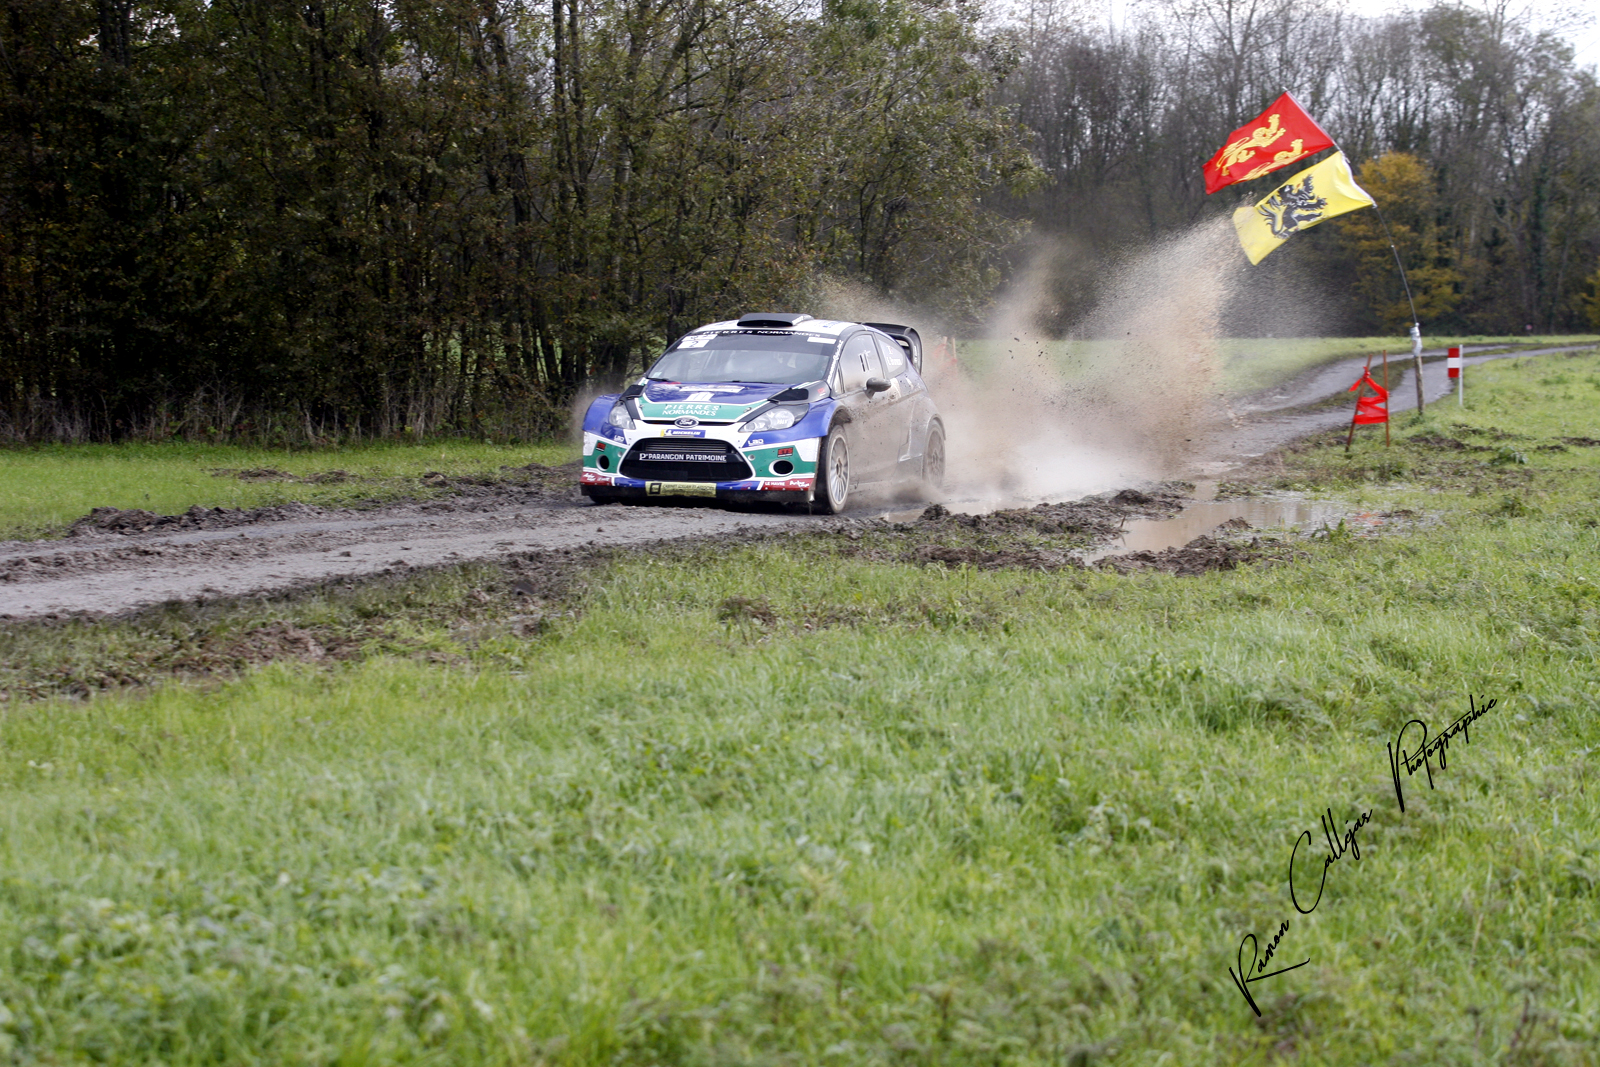 Rallye d'Automne 2019 - #  2 - Ford Fiesta WRC [1A]